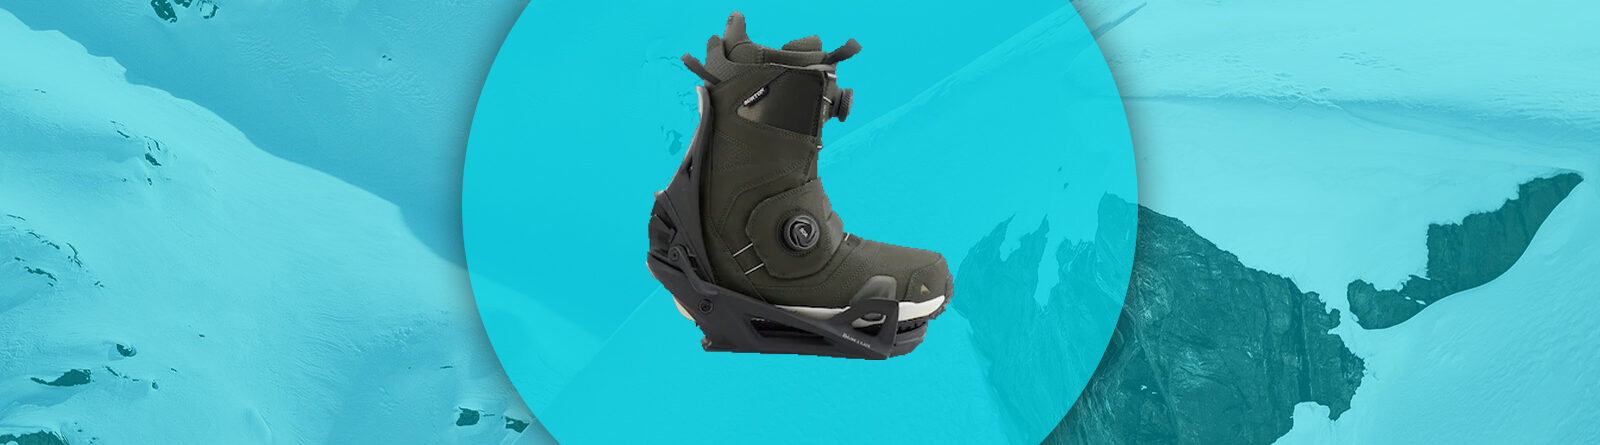 burton step on boots & bindings